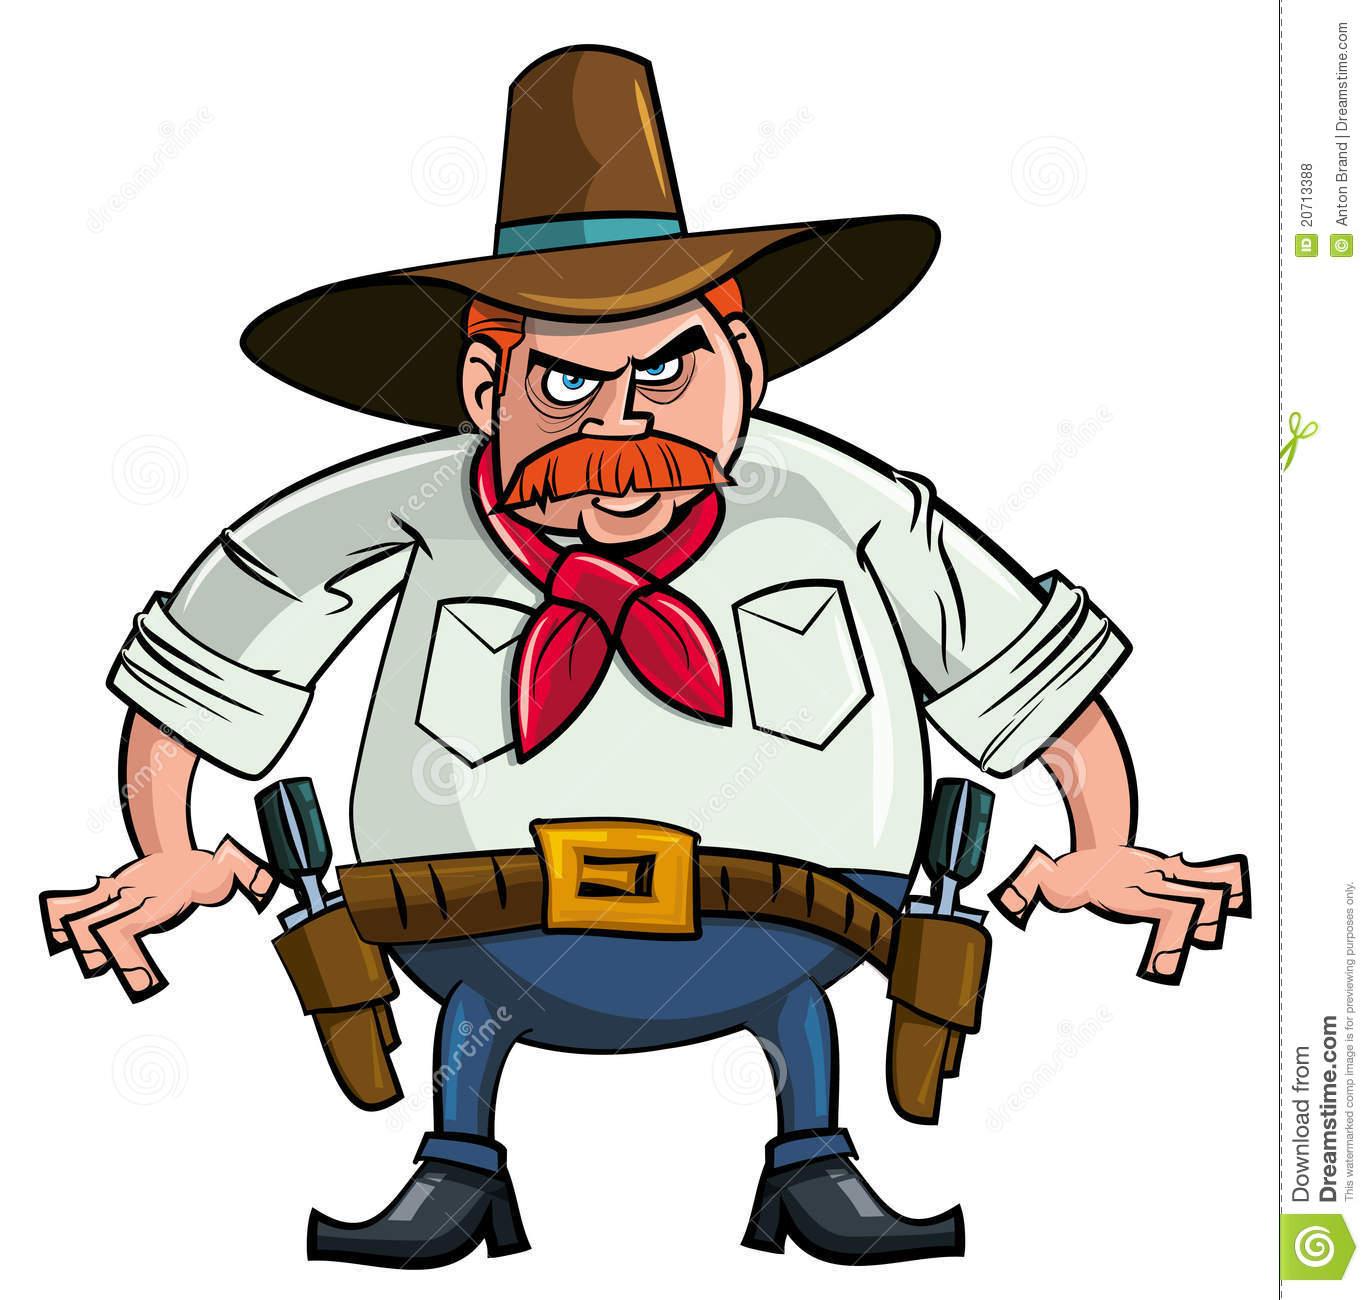 1369x1300 Cowboy Cartoon Drawings Cowboy Cartoon Drawings Cartoon Cowboy